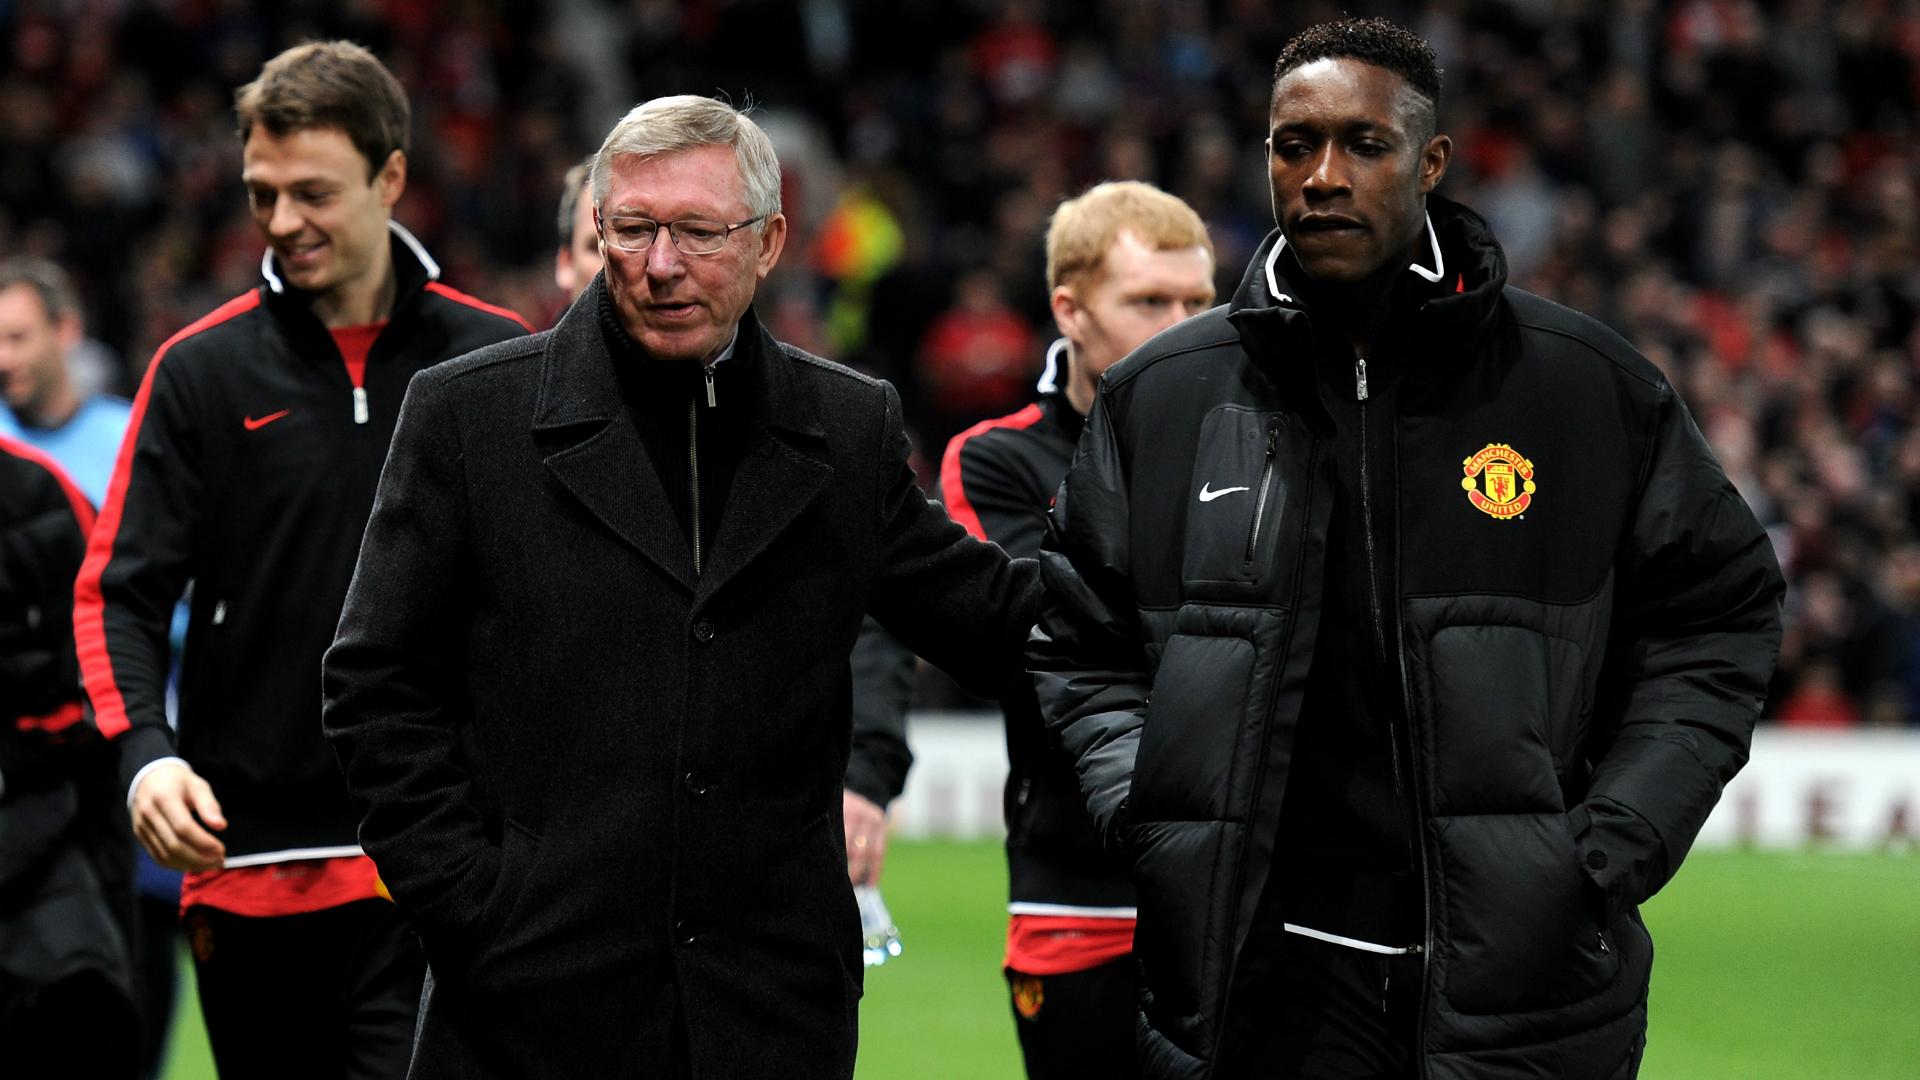 Sir Alex Ferguson, Danny Welbeck, Manchester United, Europa League, 02232012